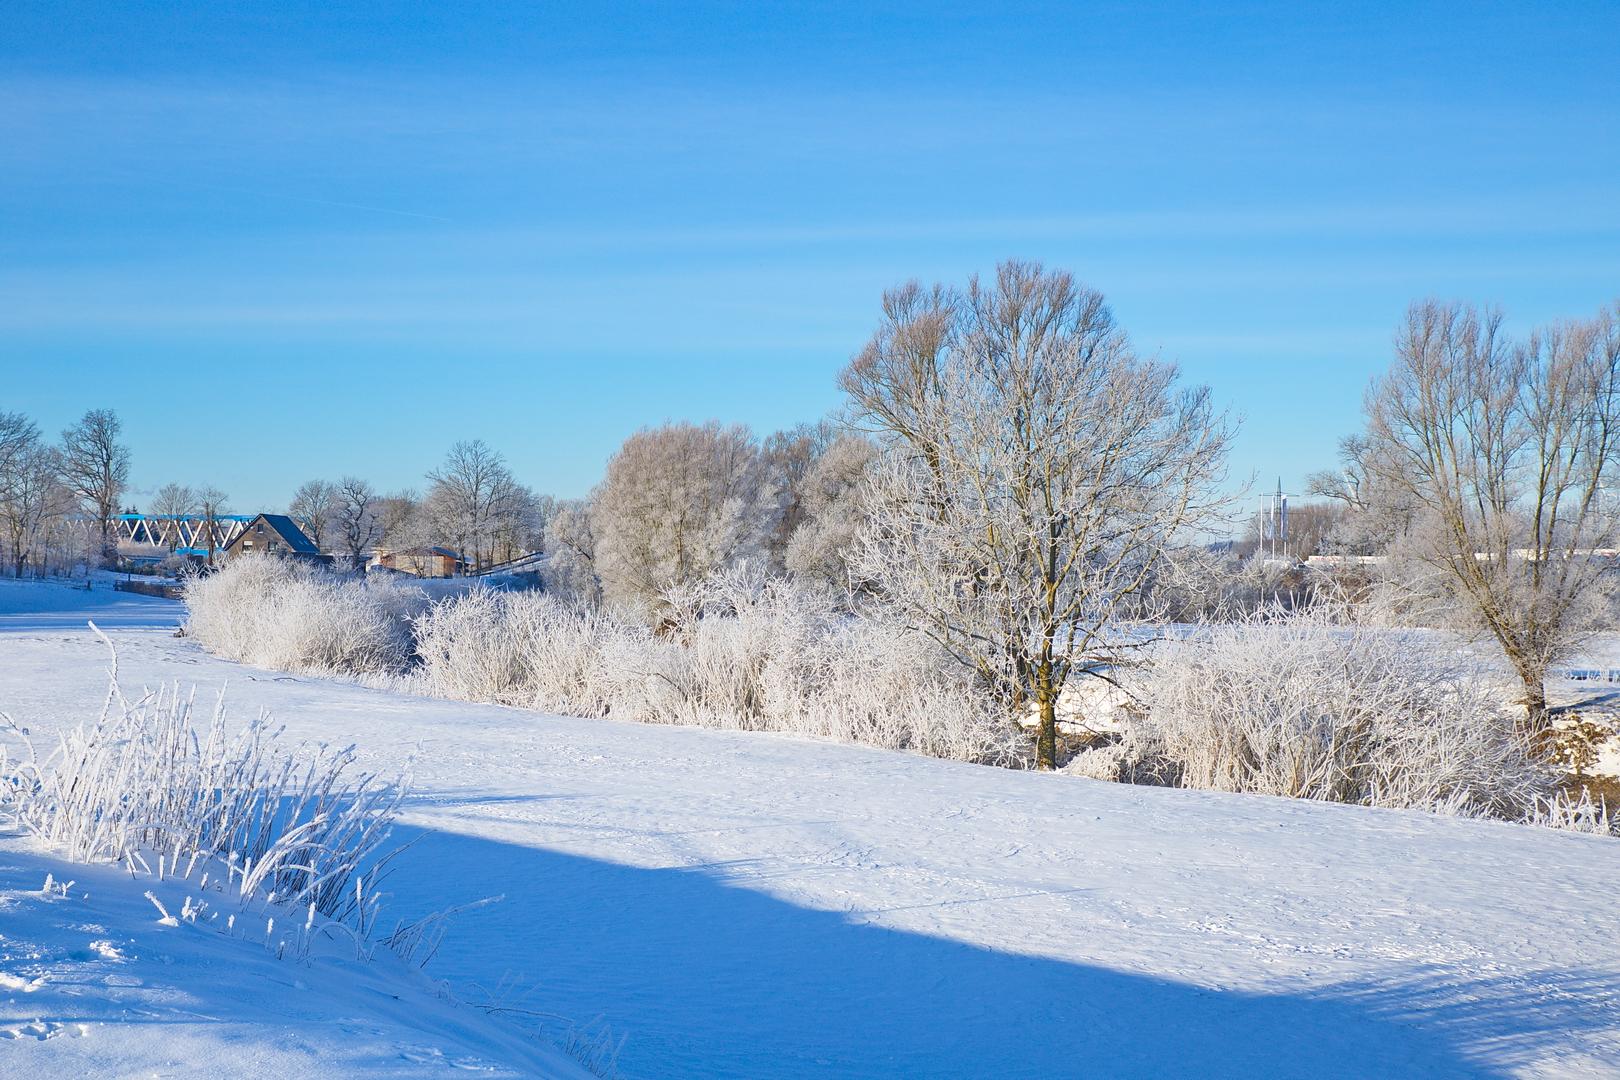 Bossendorfer Schneelandschaft im Februar 2021.